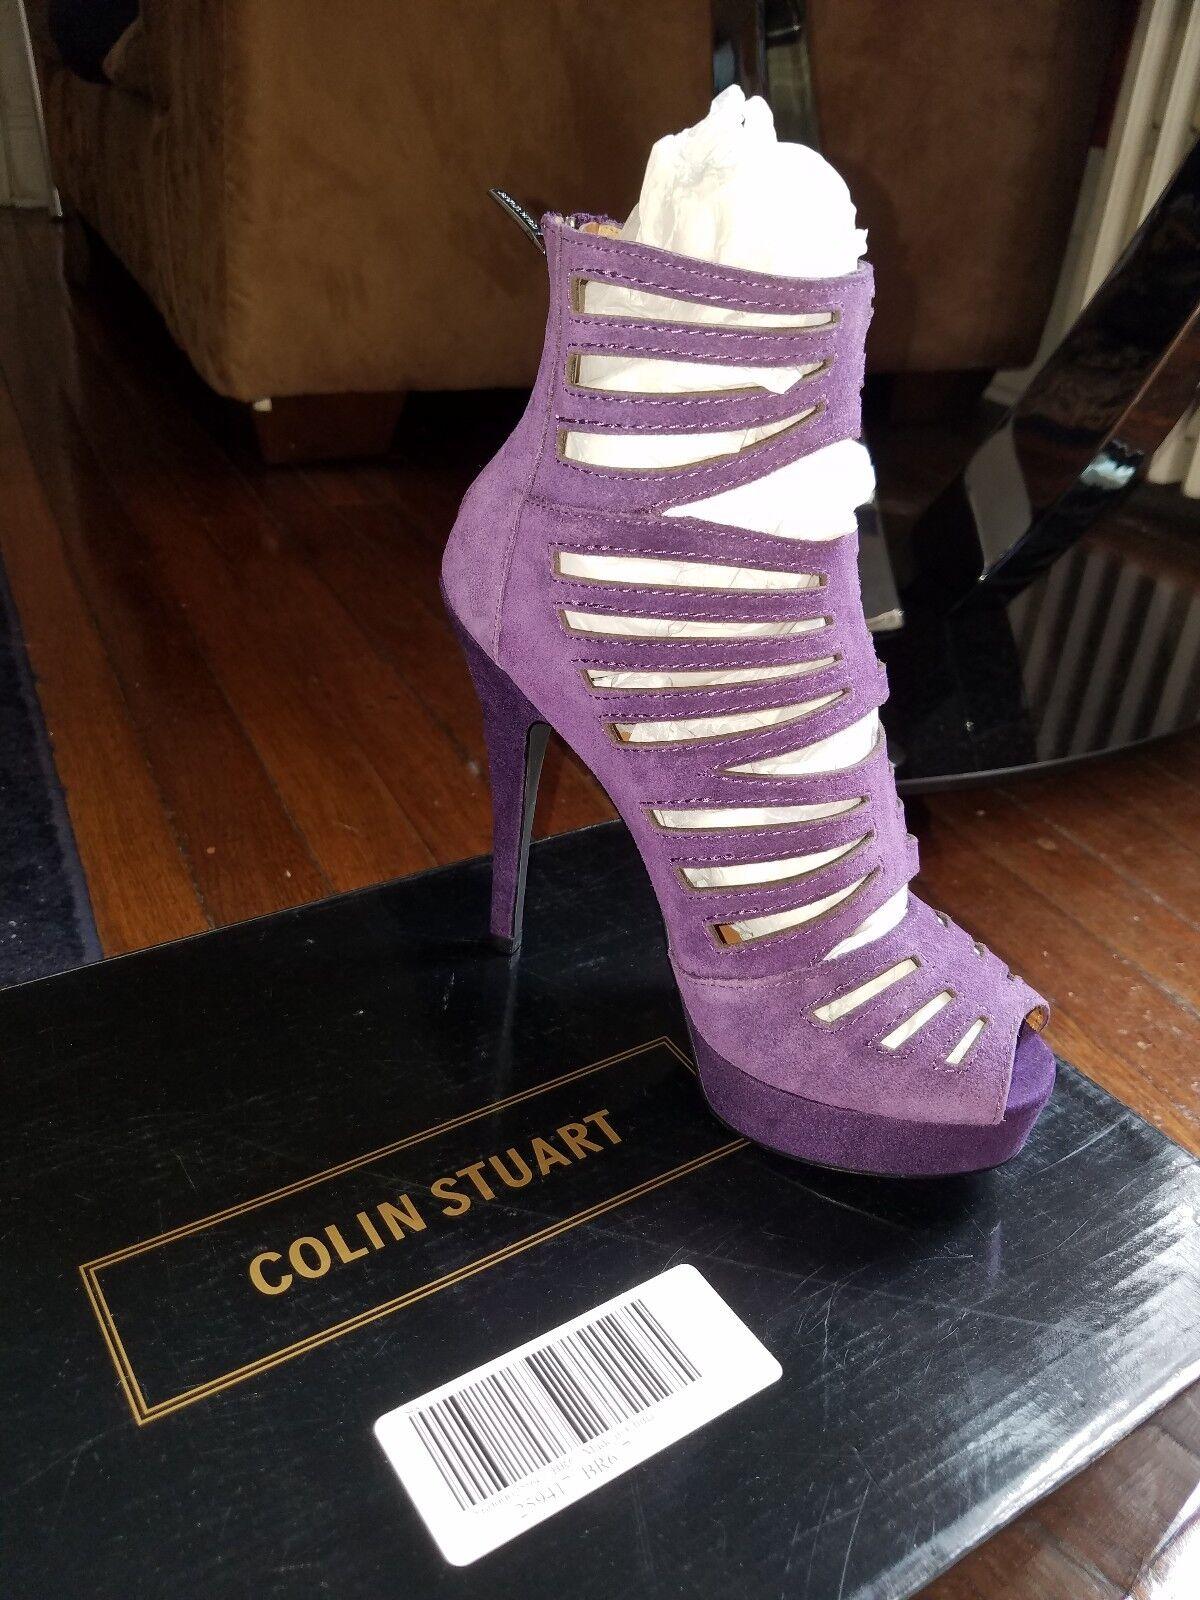 Damenss colin stuart plum Leder heels Größe 7